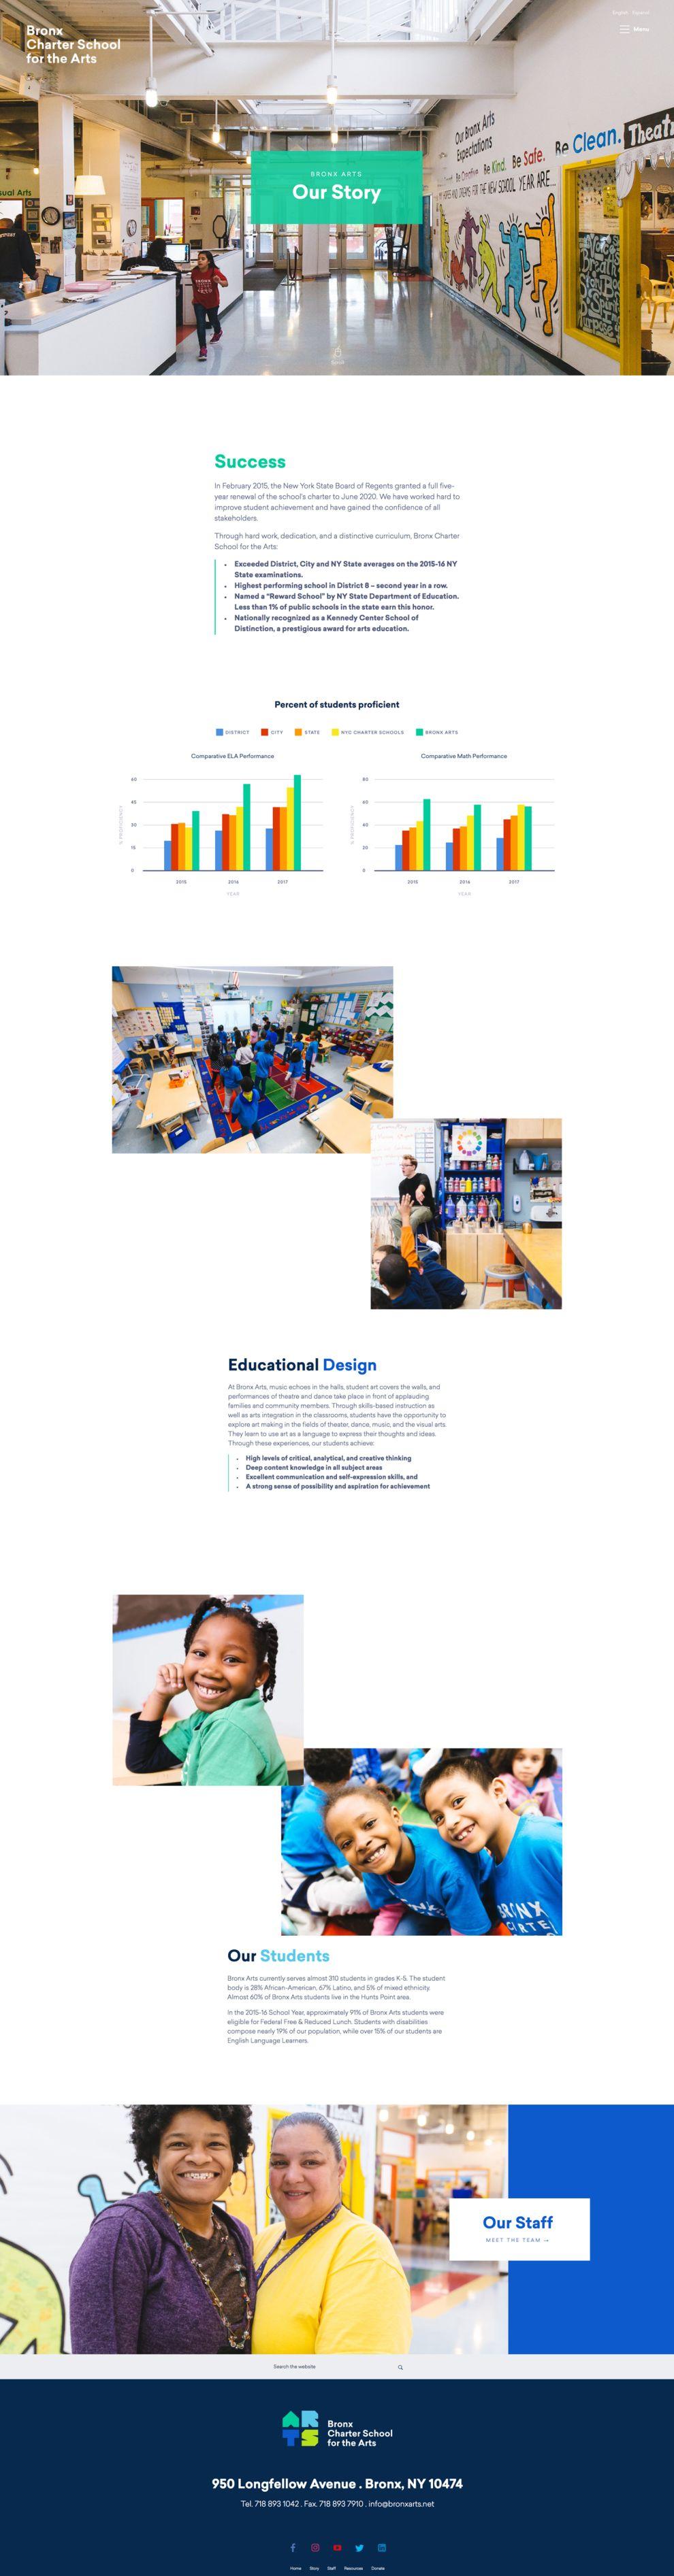 Bronx Charter School for the Arts Educational Website Design